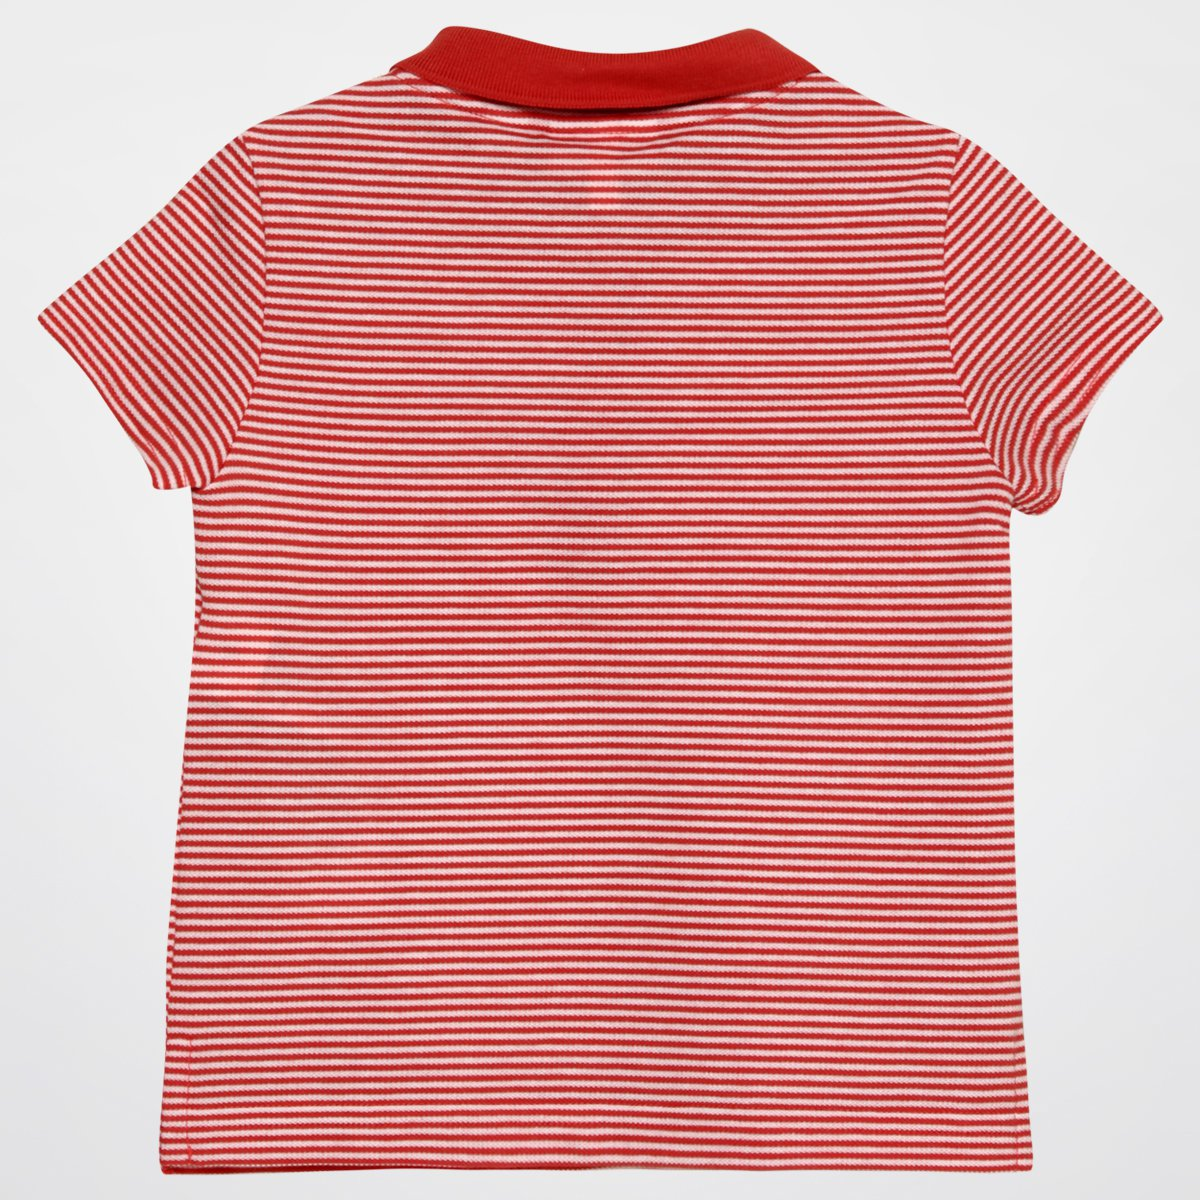 167e387624 Camisa Polo Lacoste Infantil  Camisa Polo Lacoste Infantil